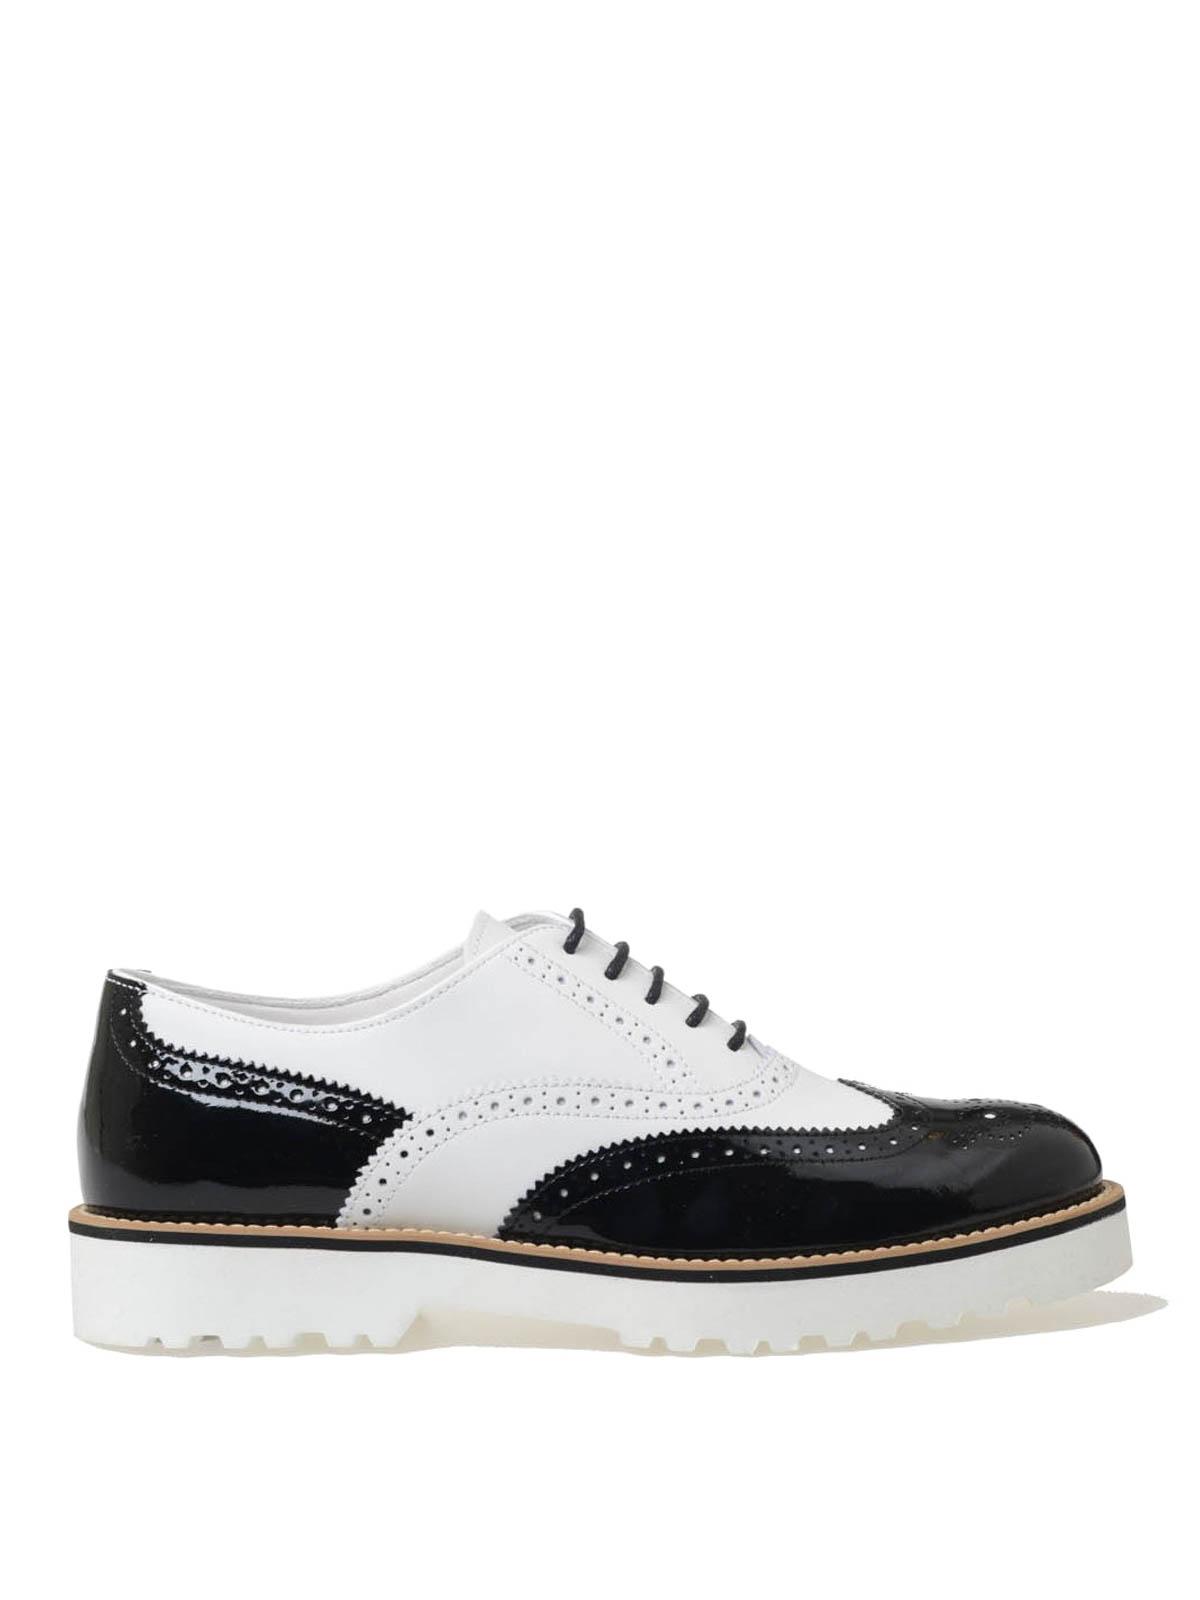 Hogan - Francesine H259 - scarpe stringate - HXW2590R3208EP0001